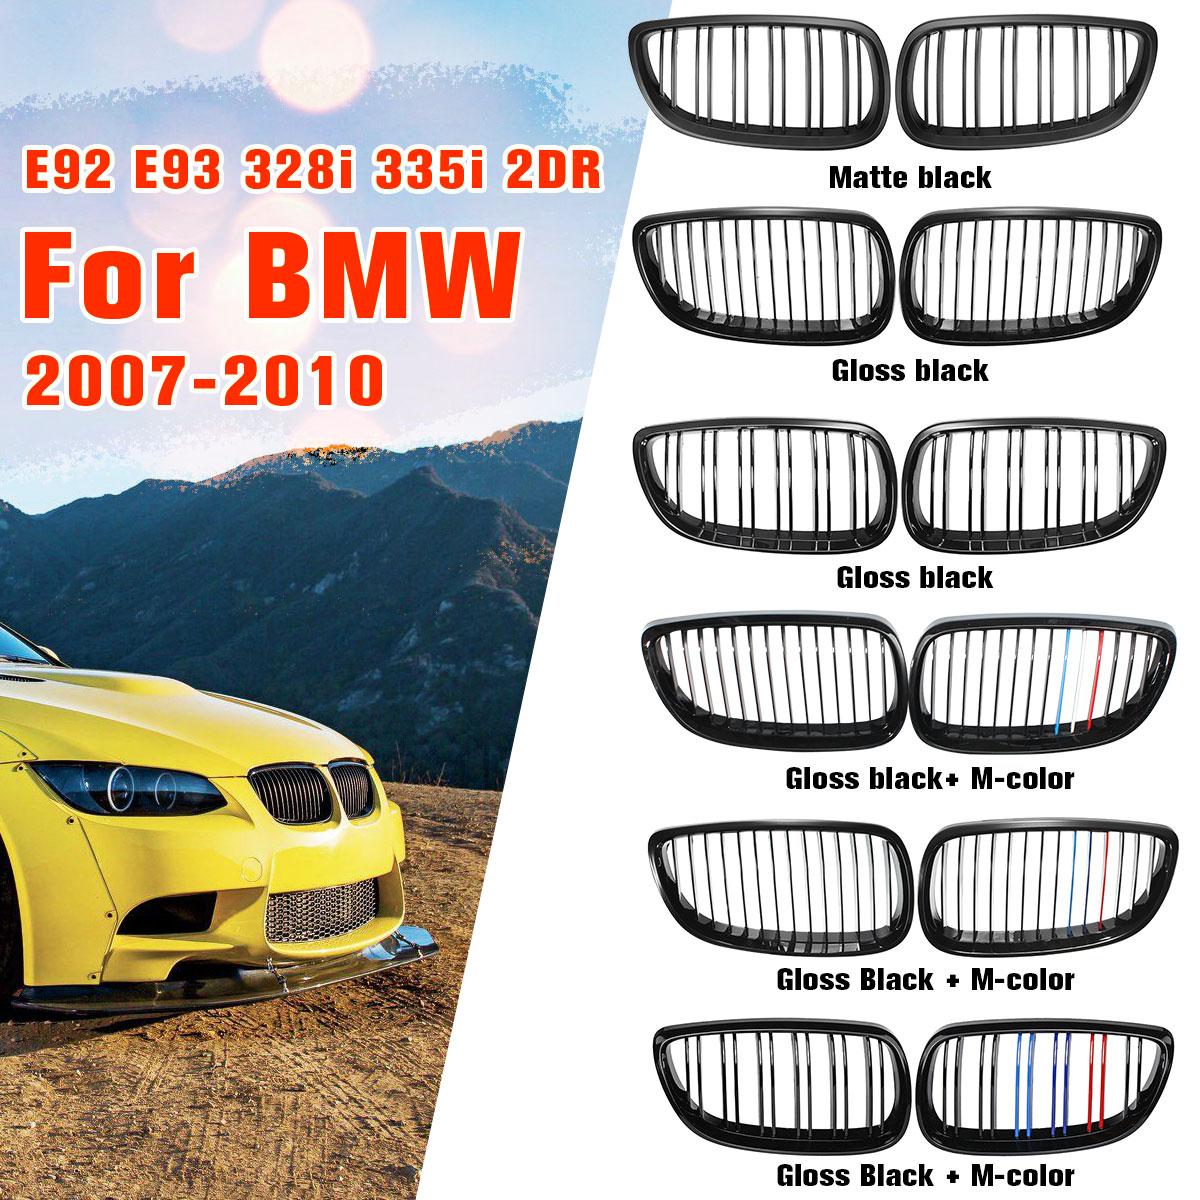 Parlak mat siyah m-renk çift hat ön izgara Kidney izgara için BMW E92 E93 M3 328i 335i 2 kapı 2007 2008 2009 araba Styling